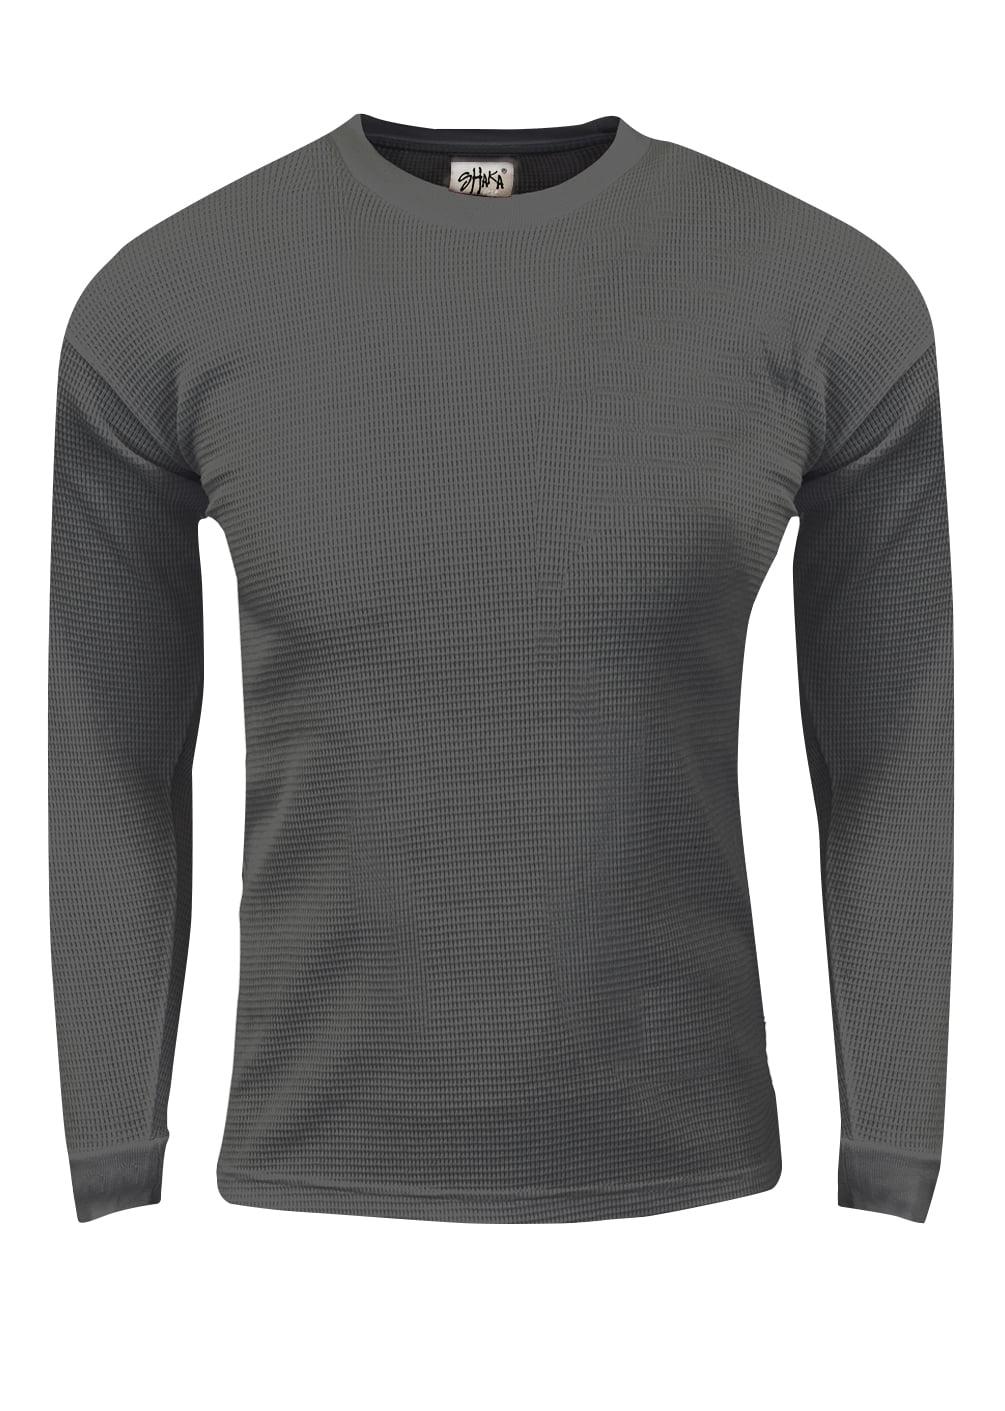 Shaka Wear Kids Waffle Thermal Long Sleeve Crewneck T Shirt XXS-XL